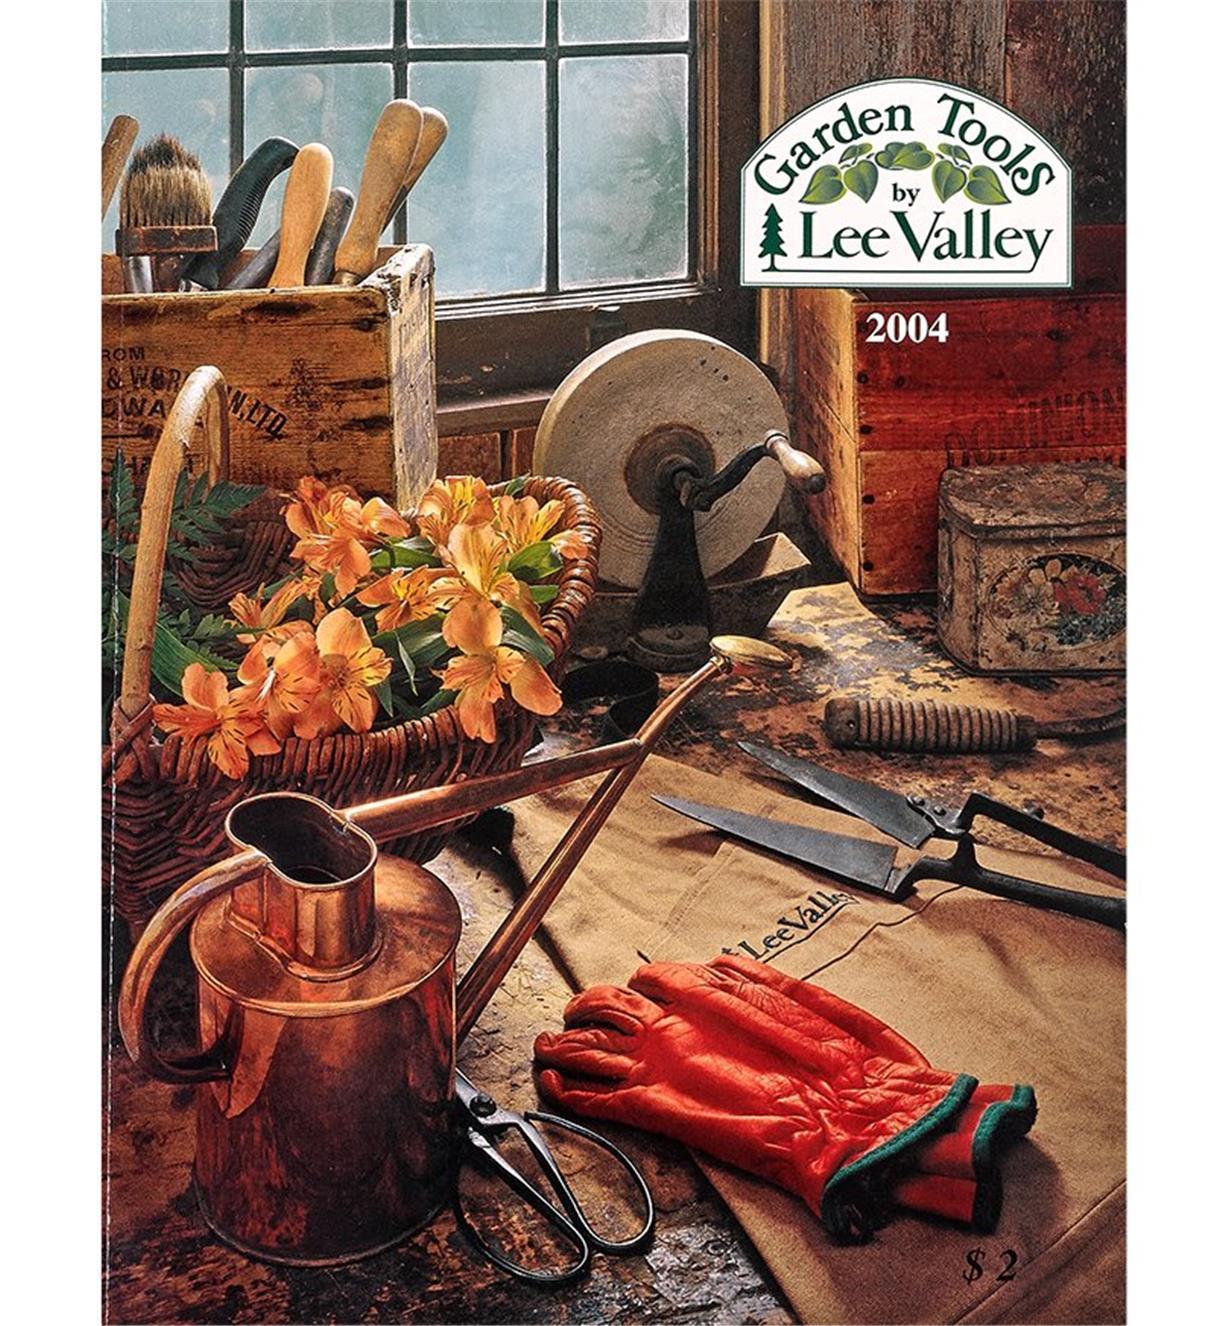 CG0204 - Garden Tools 2004, Canada